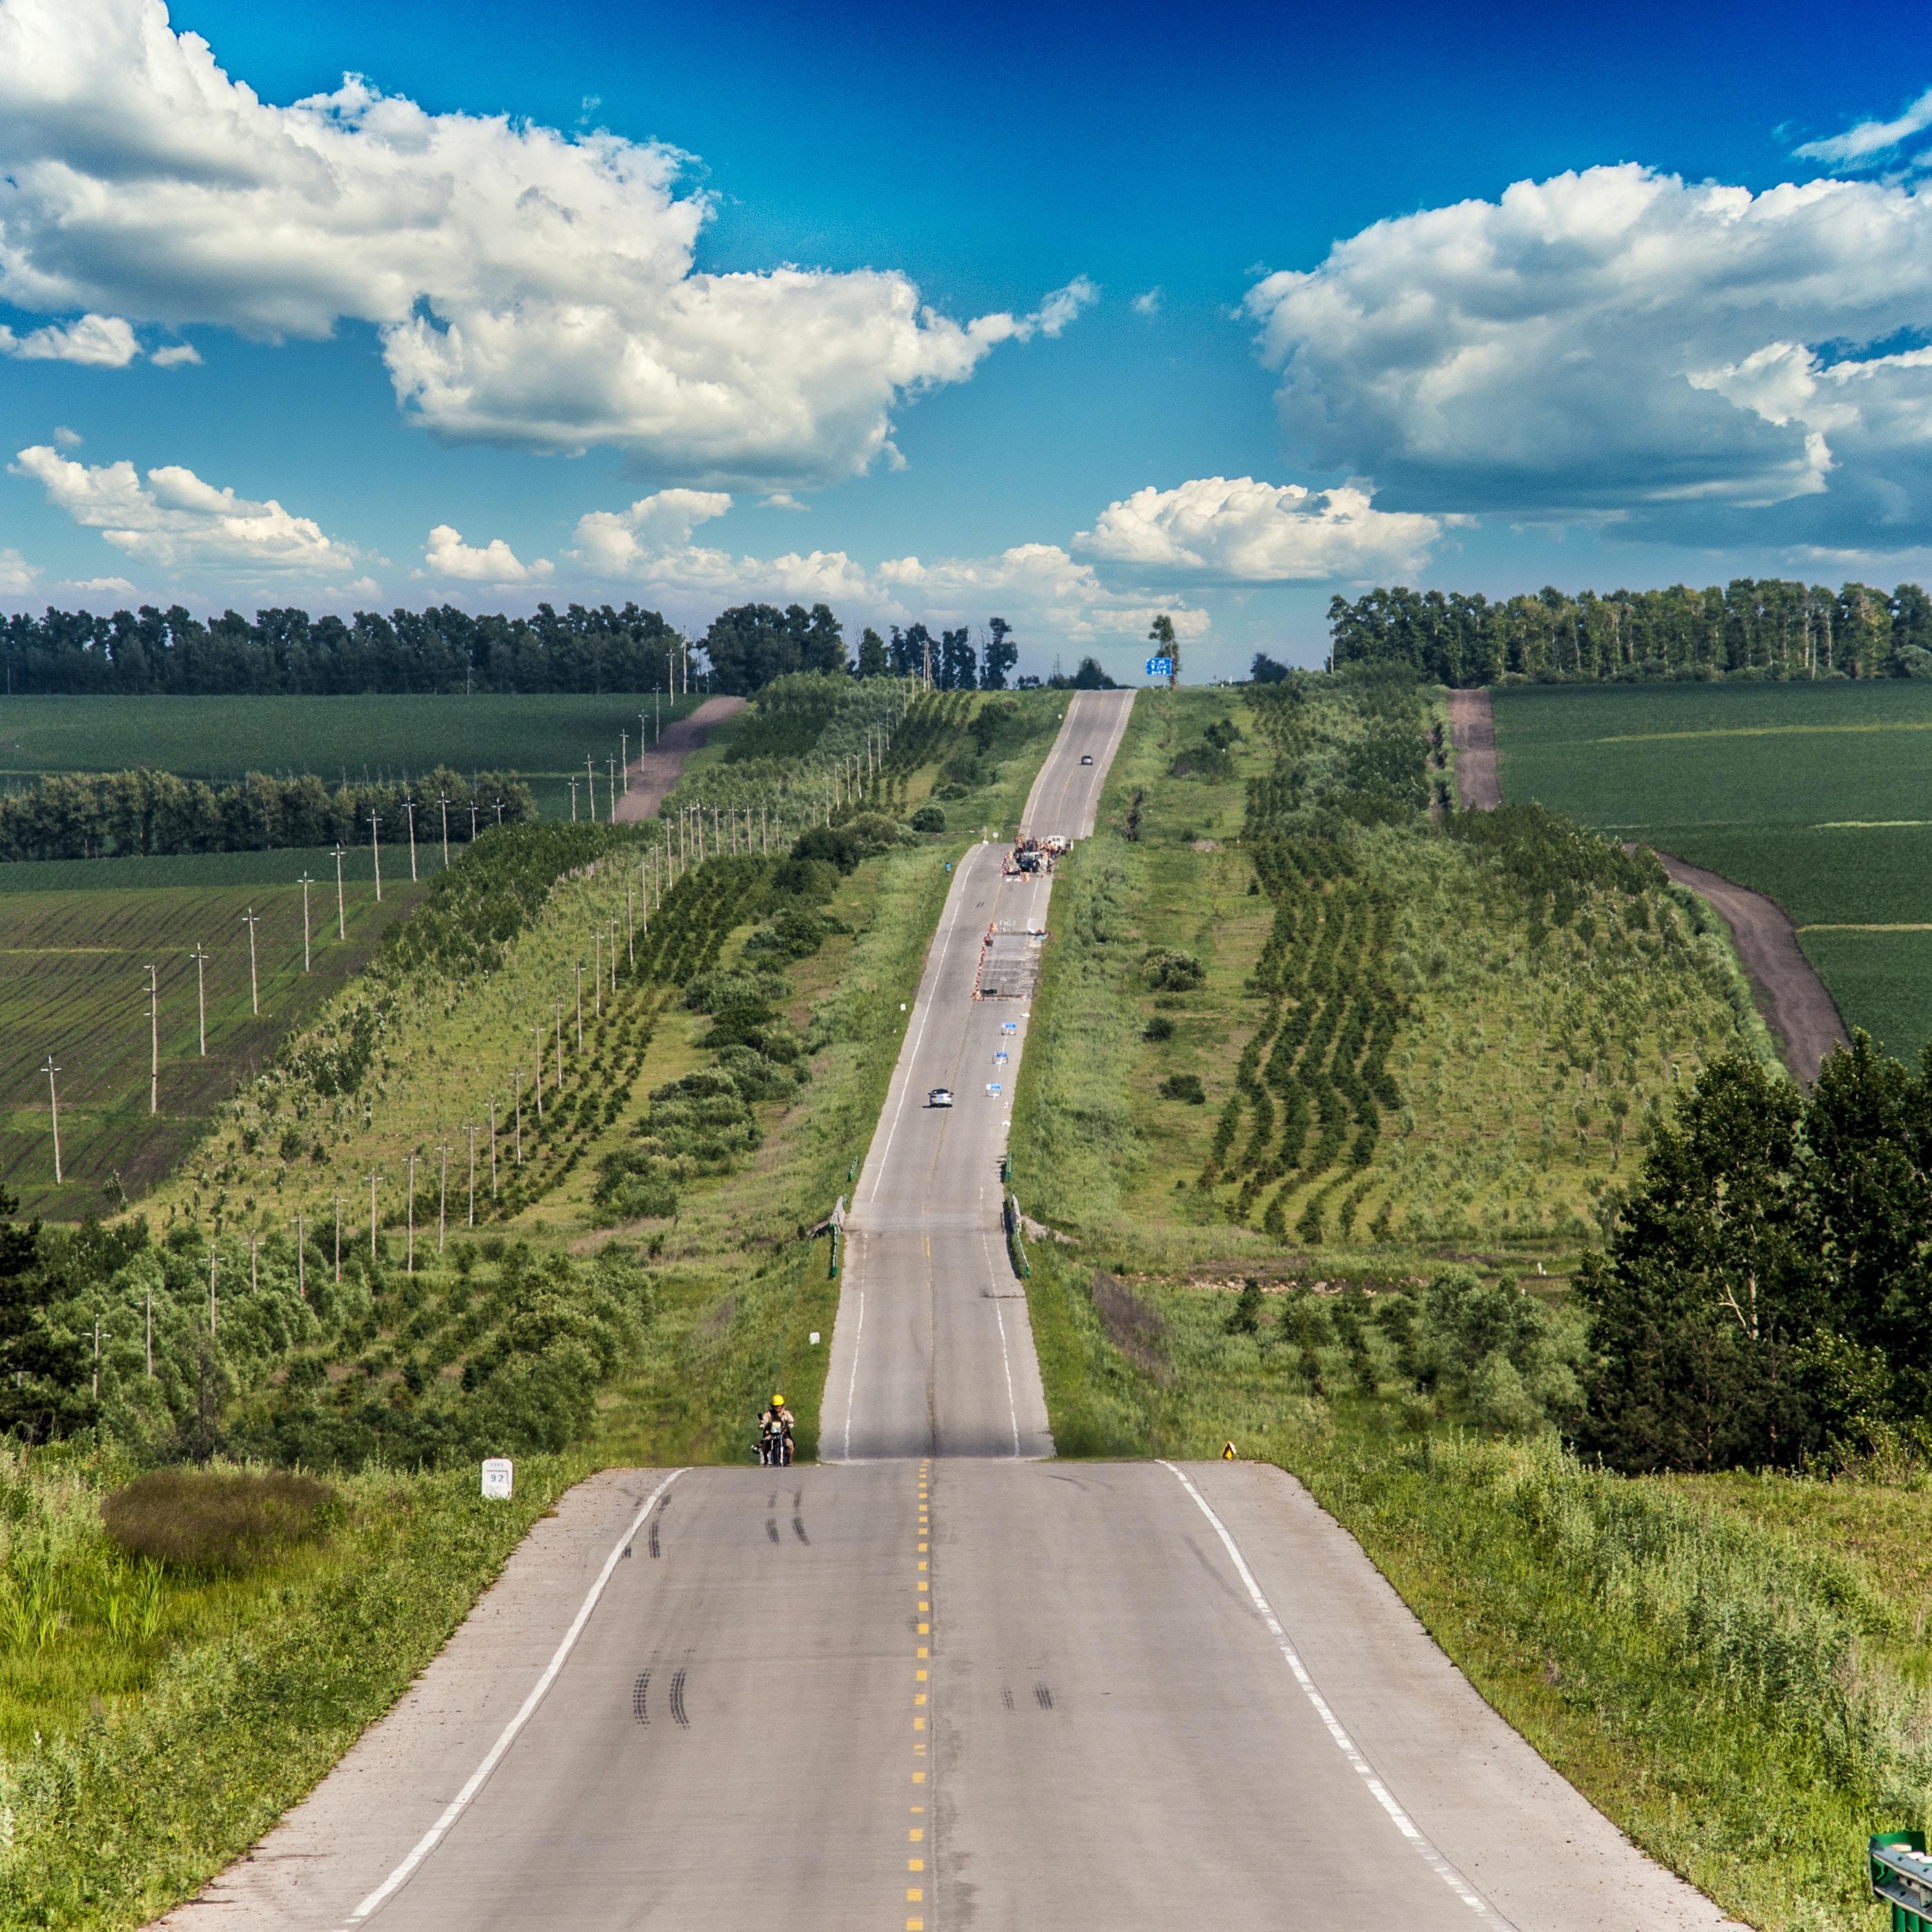 long road in between bushes